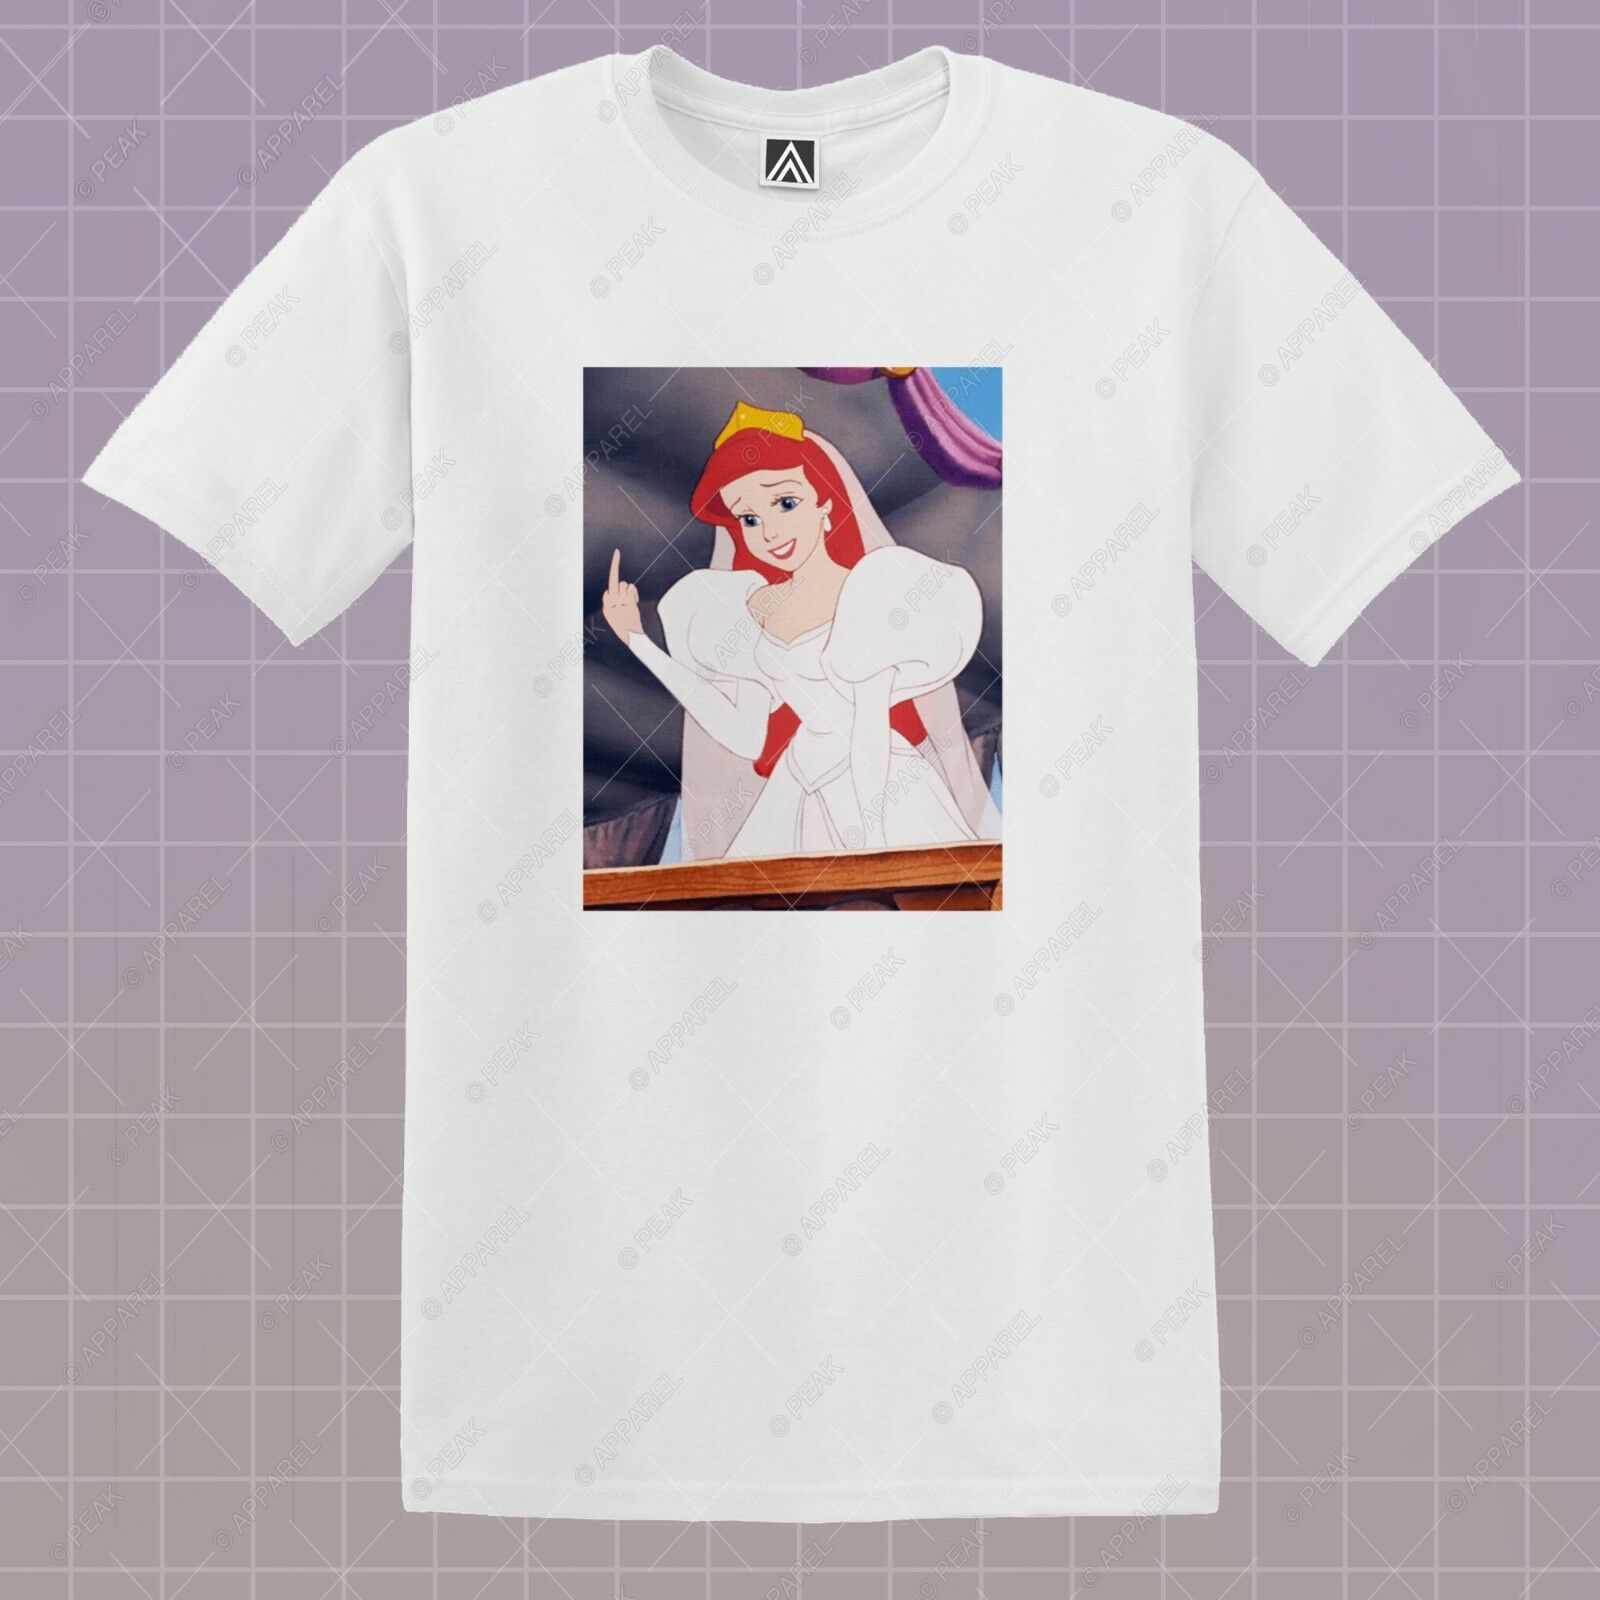 Ariel f * ck fora camiseta sereia princesa gráfico camiseta ursula elsa manga curta topo